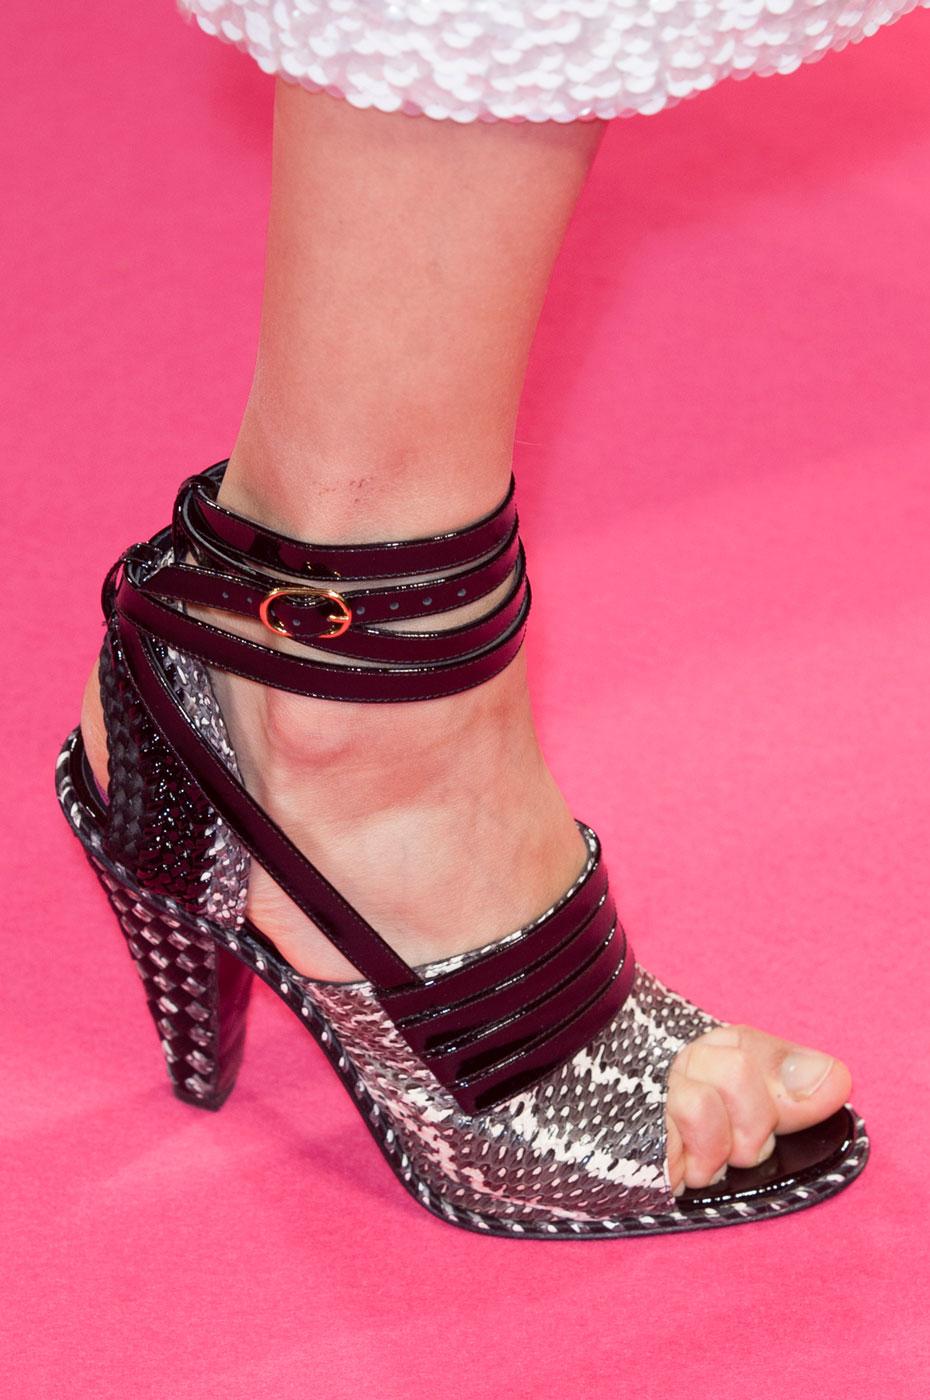 Schiaparelli-fashion-runway-show-close-ups-haute-couture-paris-spring-summer-2015-the-impression-06